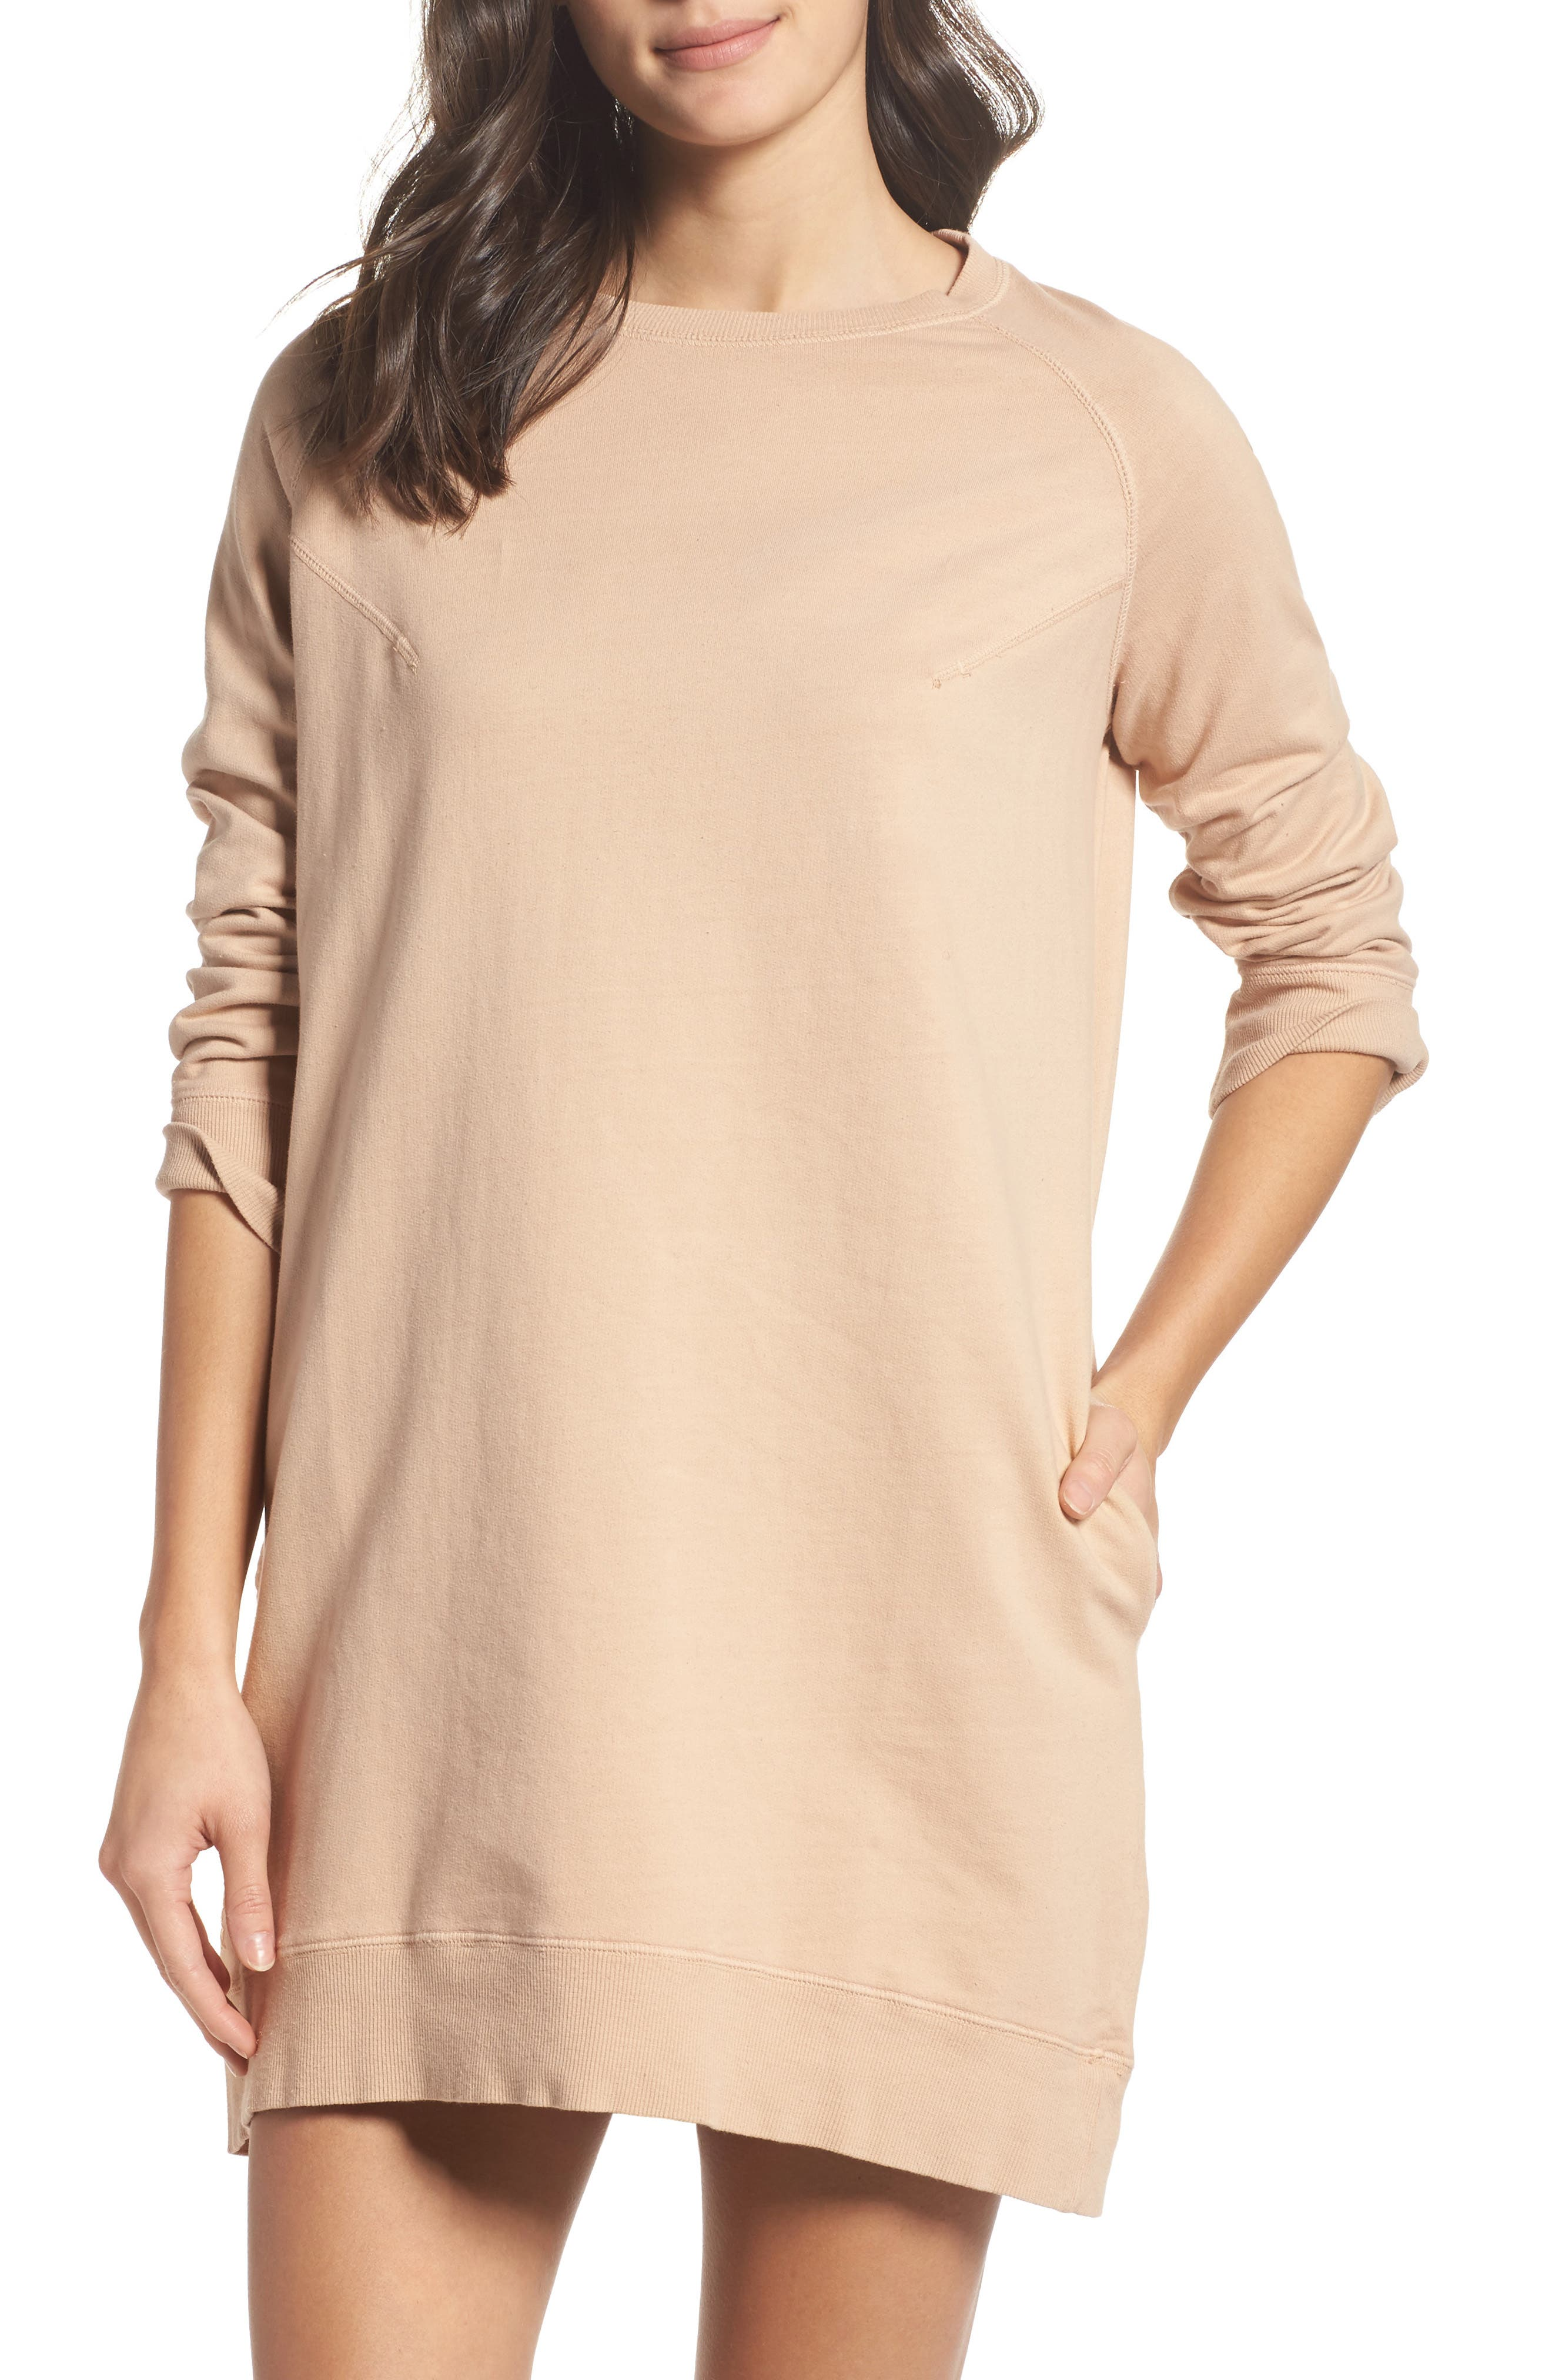 Sweatshirt Dress,                         Main,                         color, 950